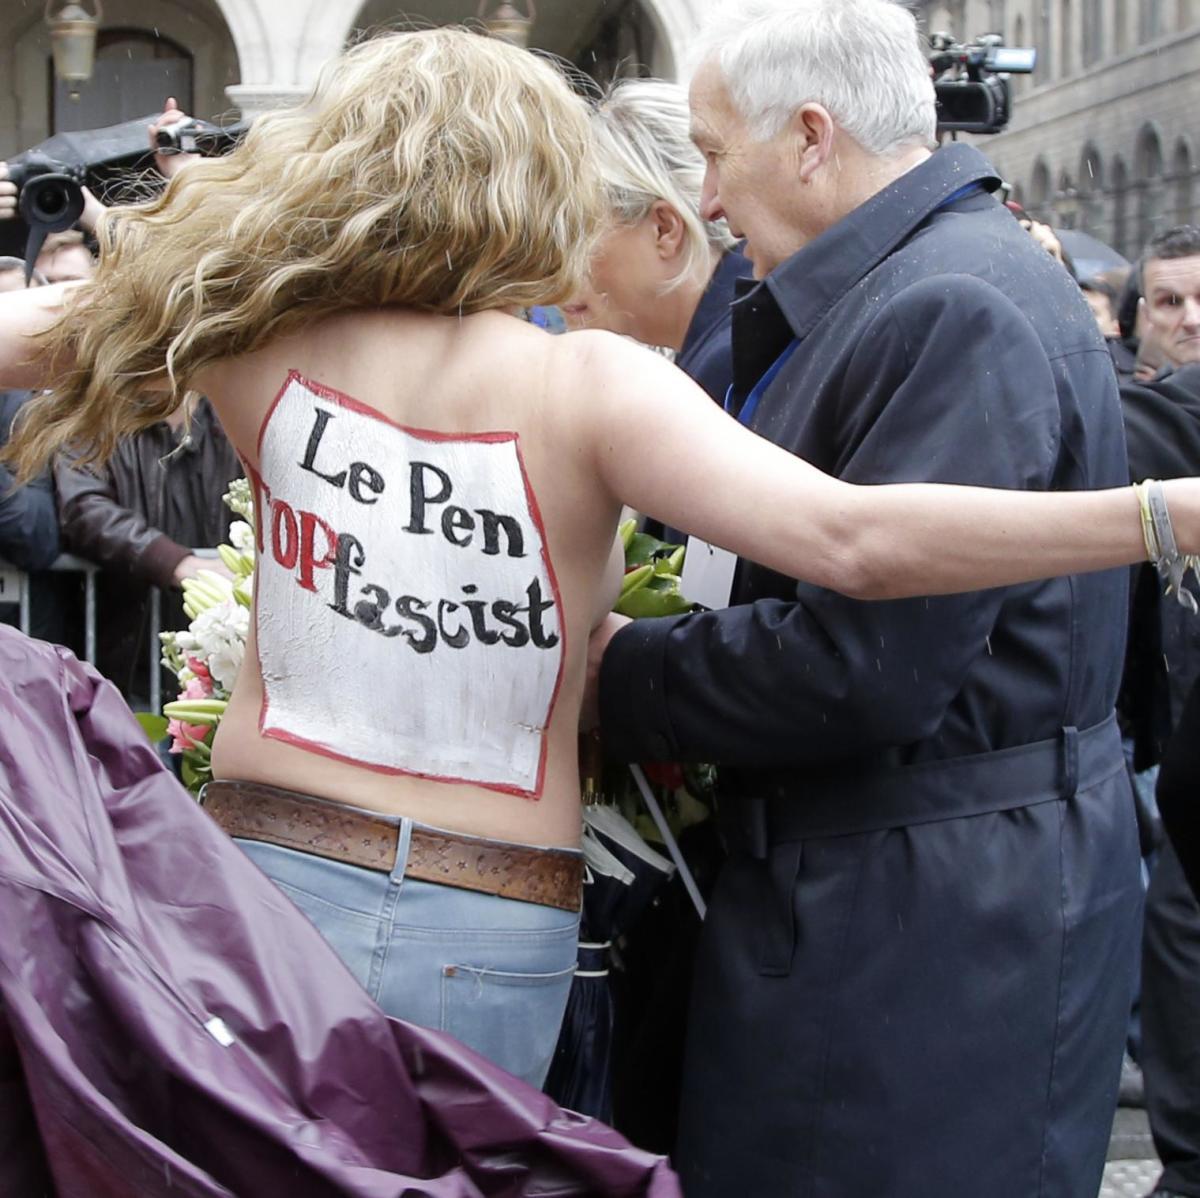 FEMEN Disrupting Marine Le Pen's May Day Speech in Paris